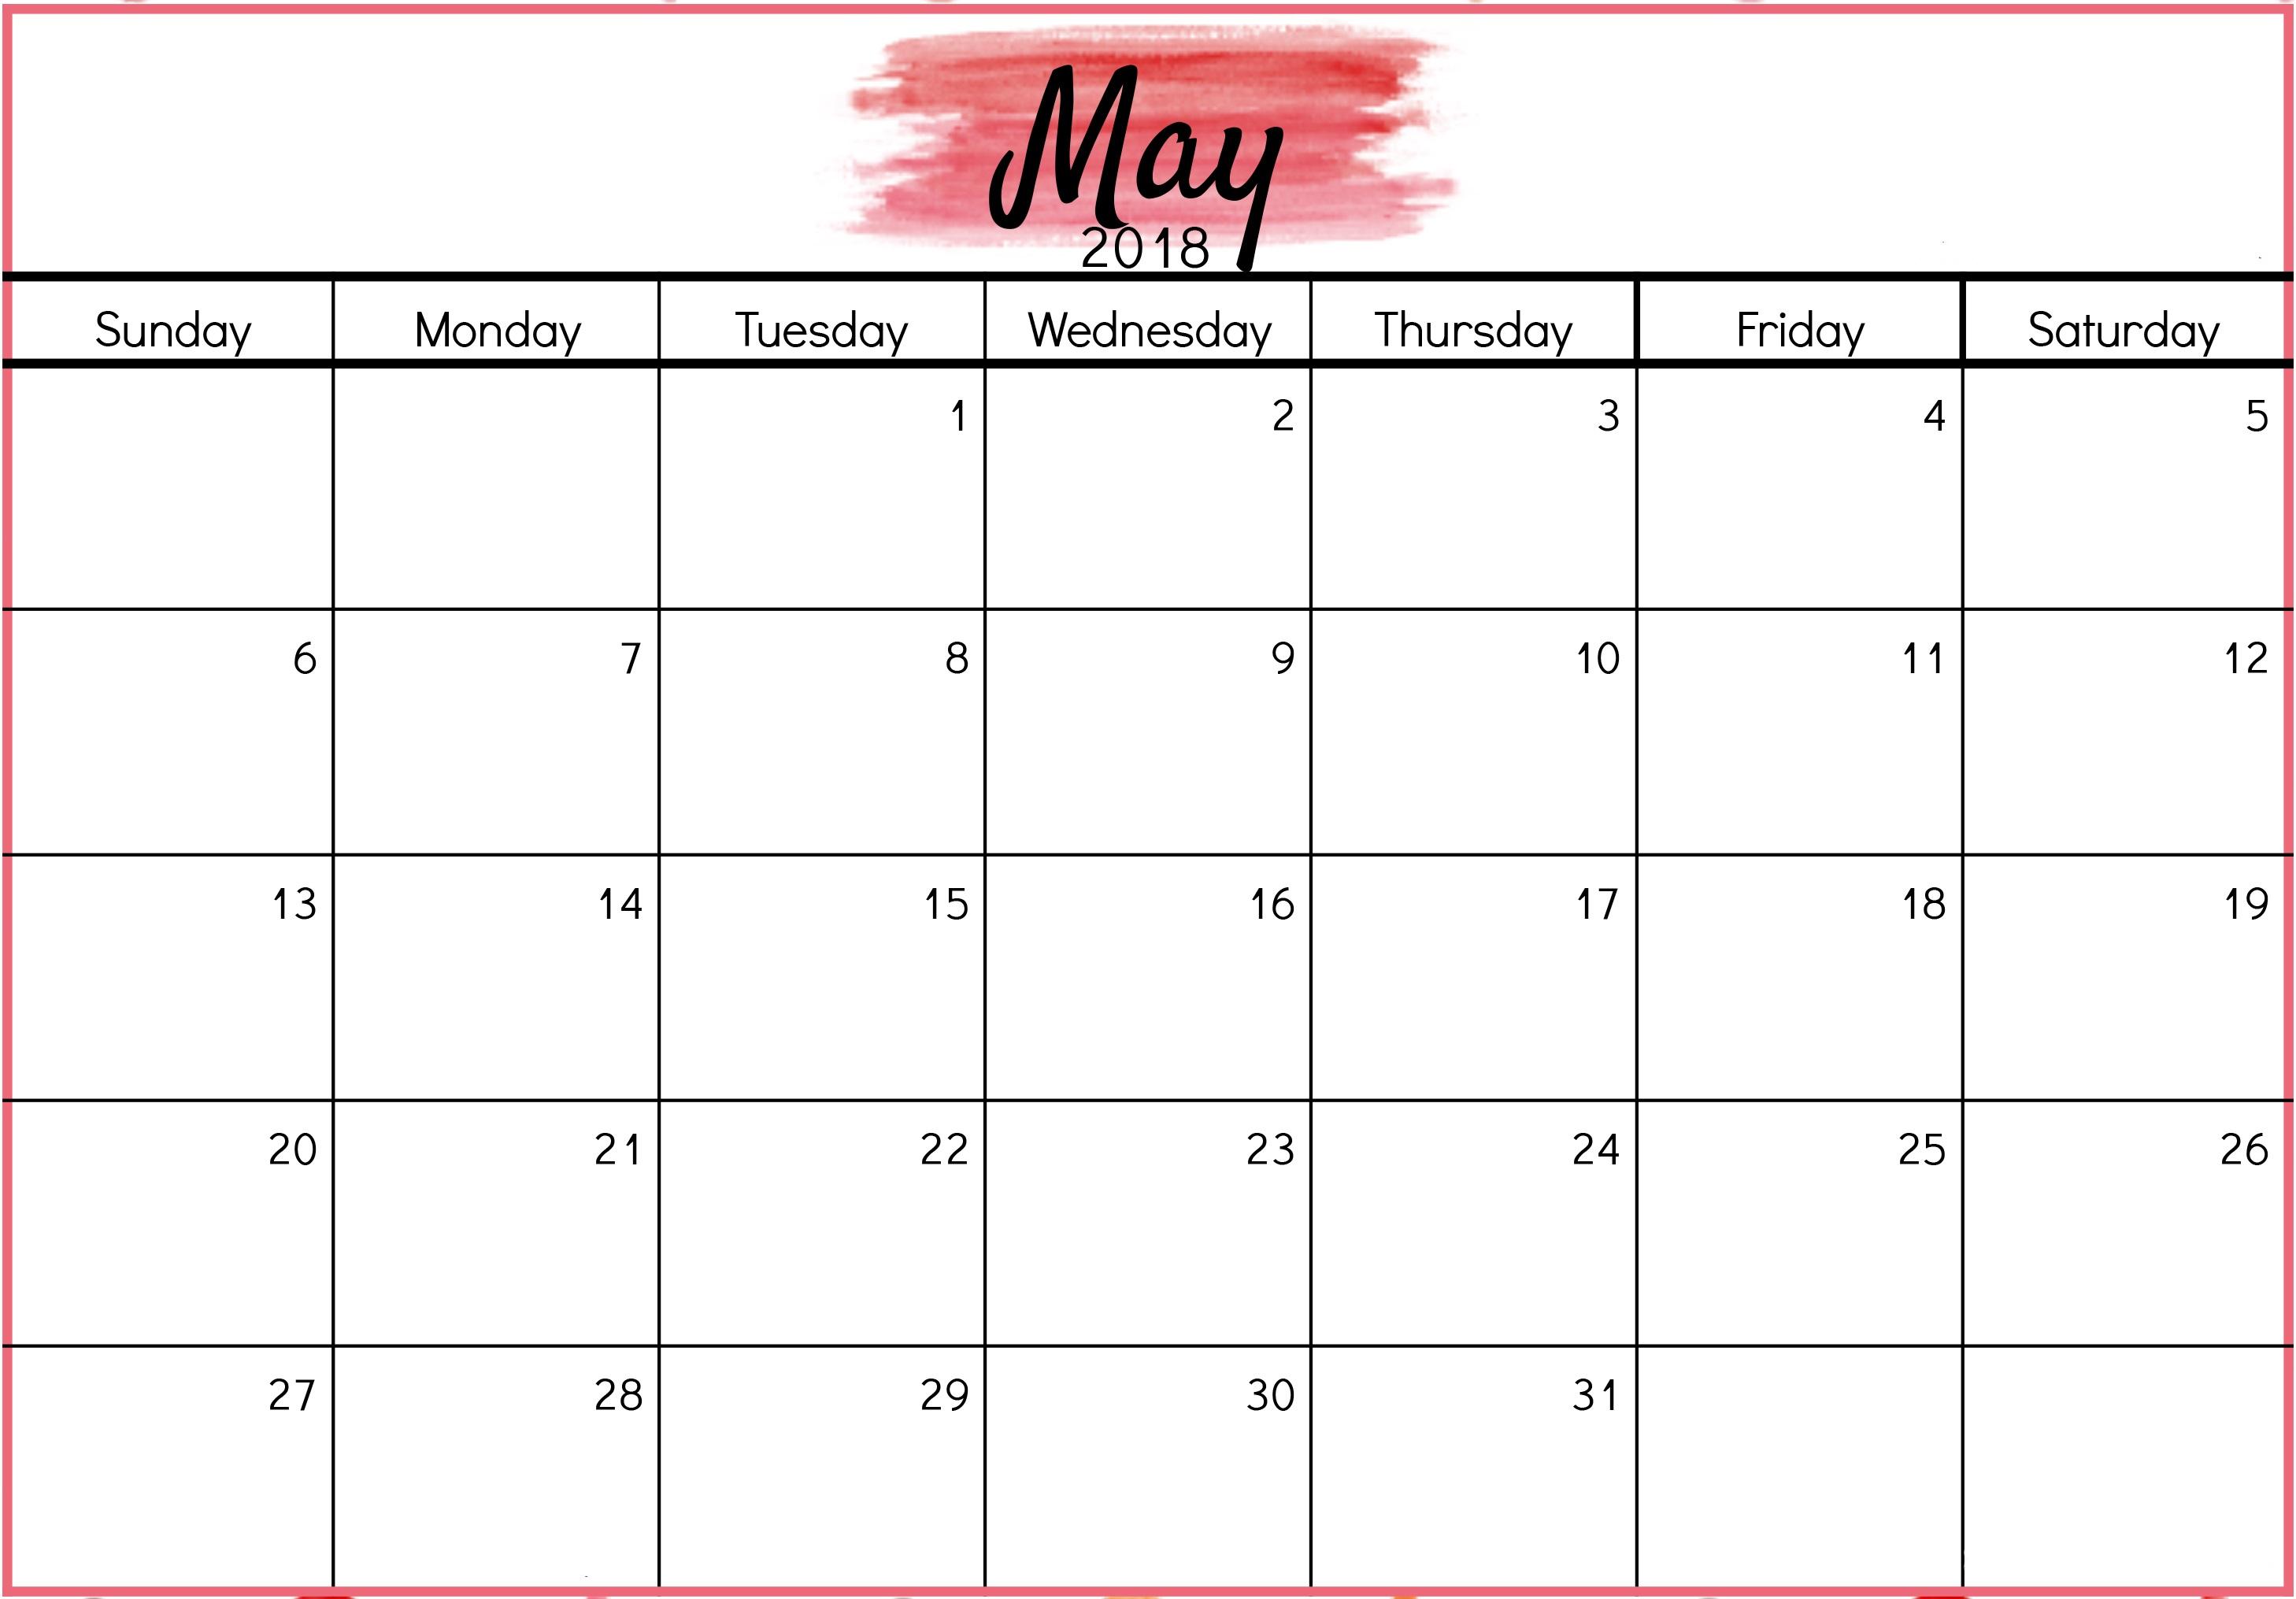 May 2018 Calendar Pink